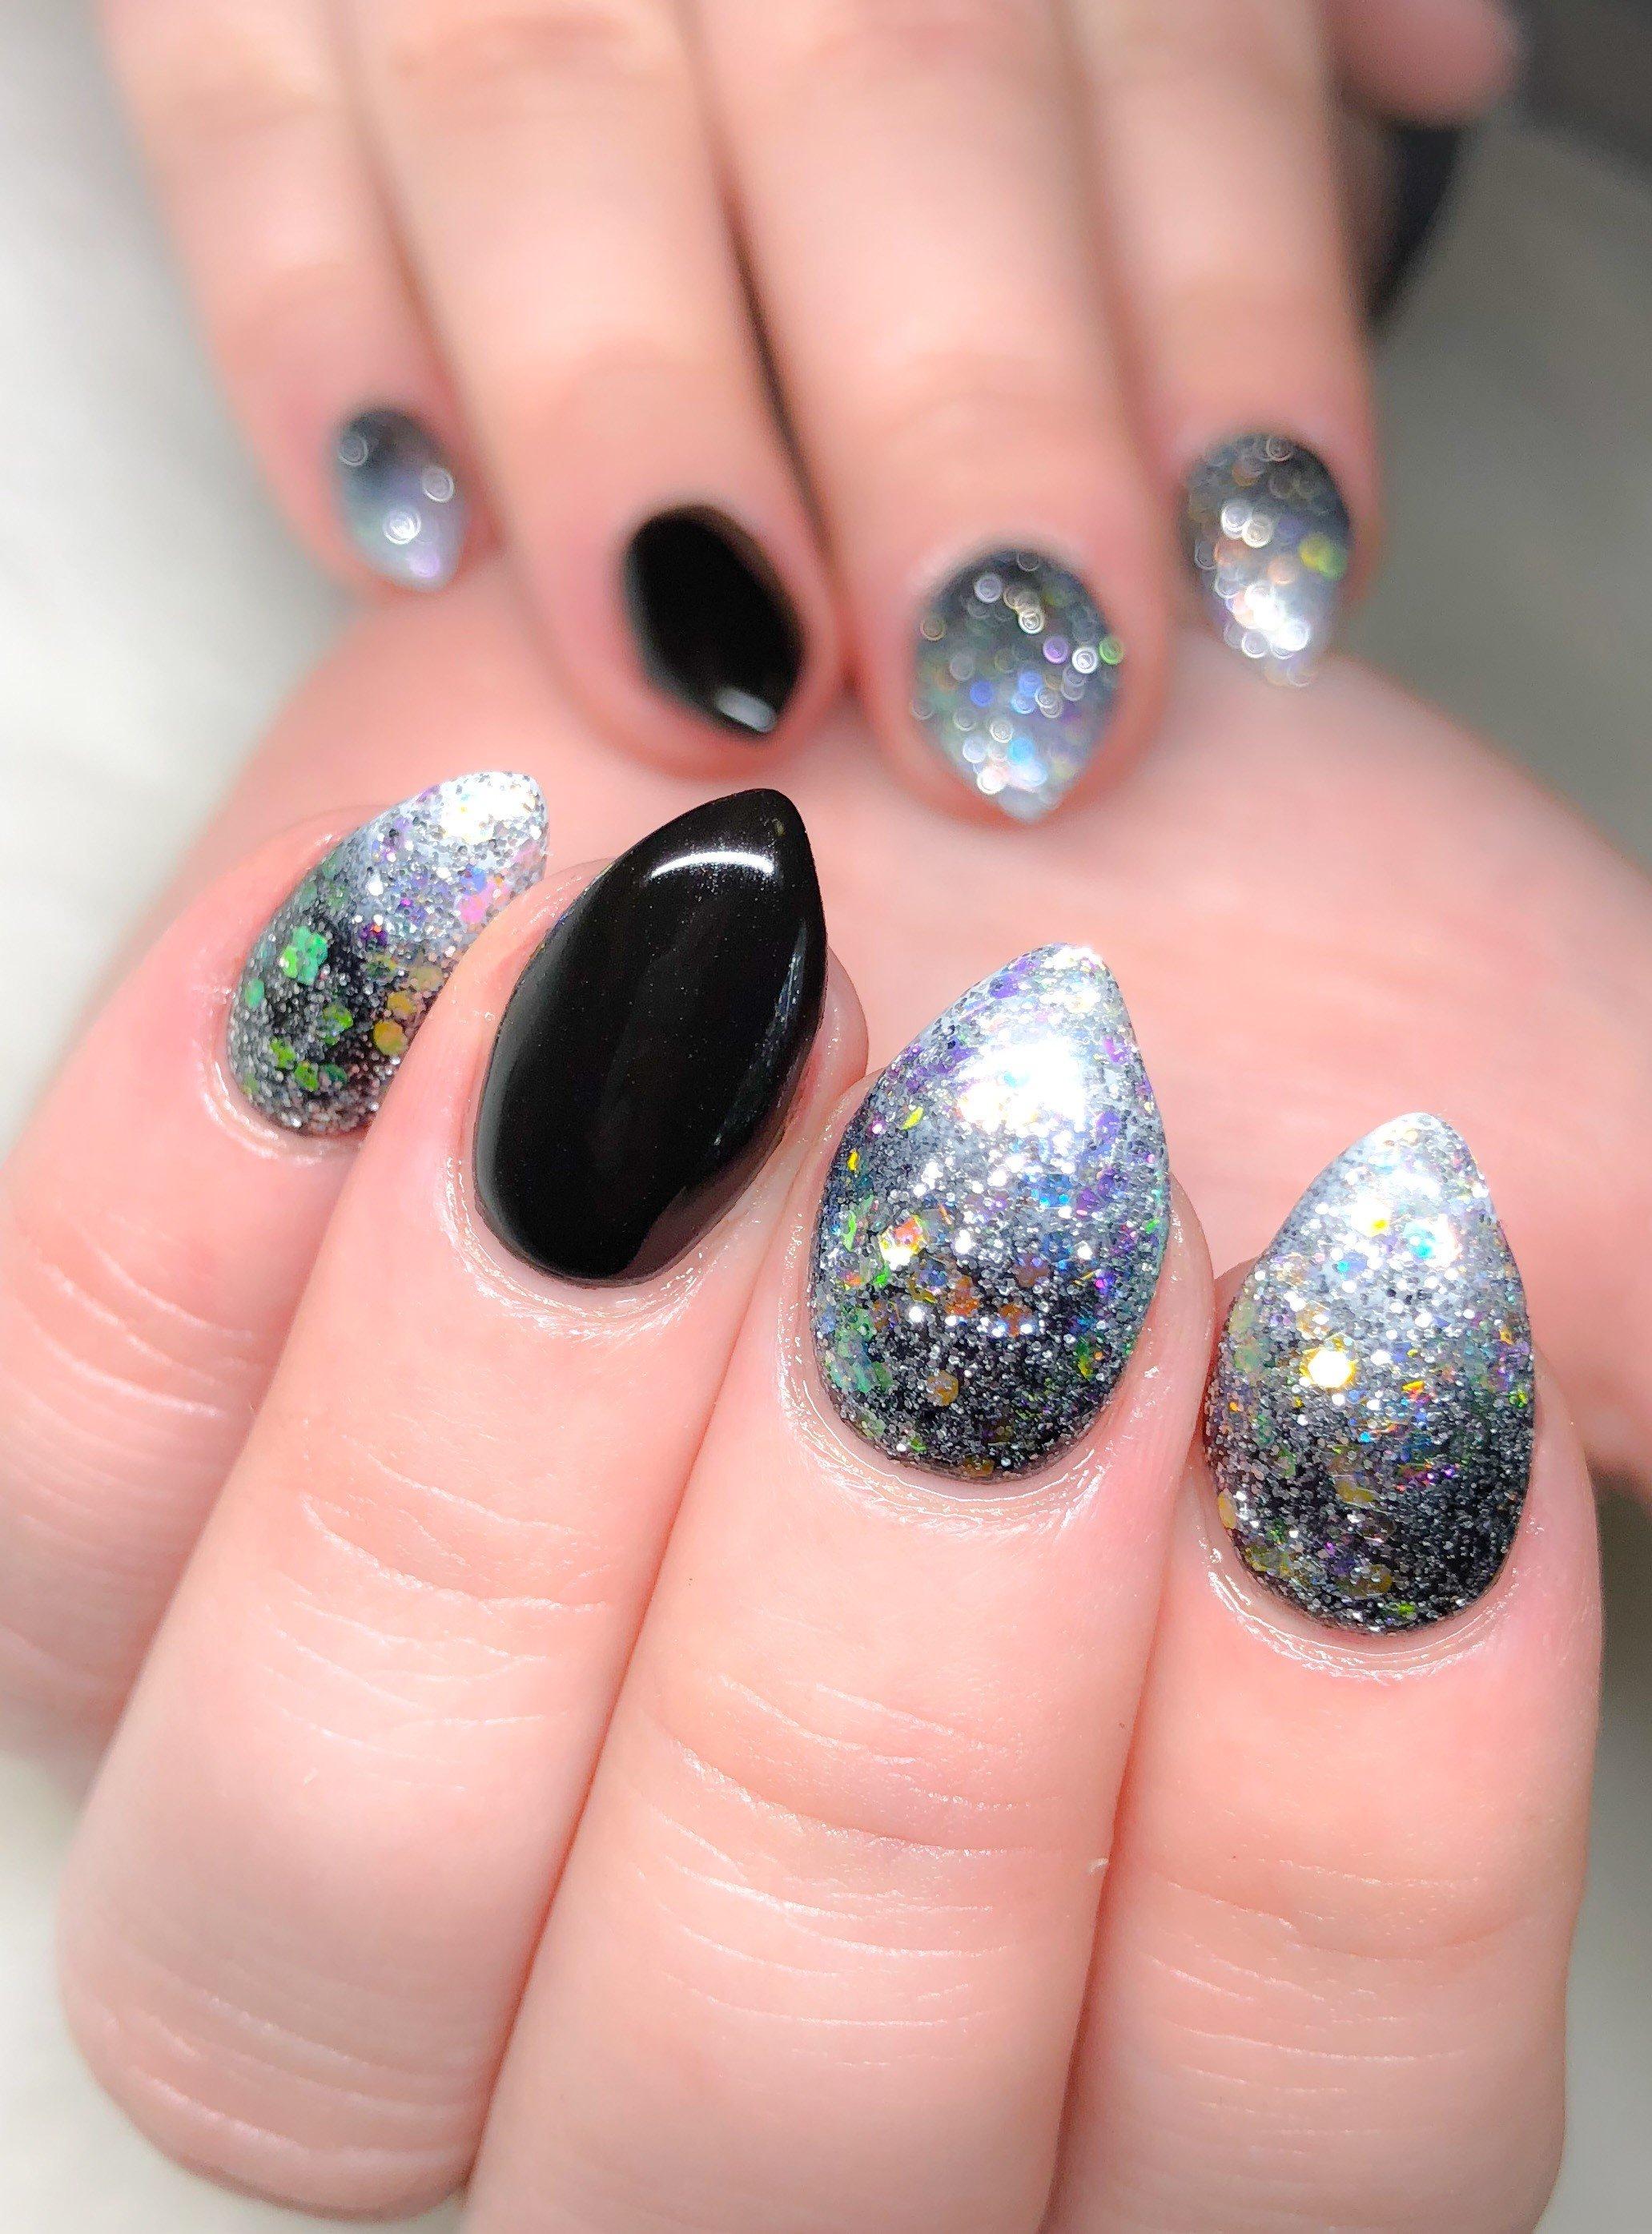 Day 3: Glitter and Dreamcatcher Nail Art